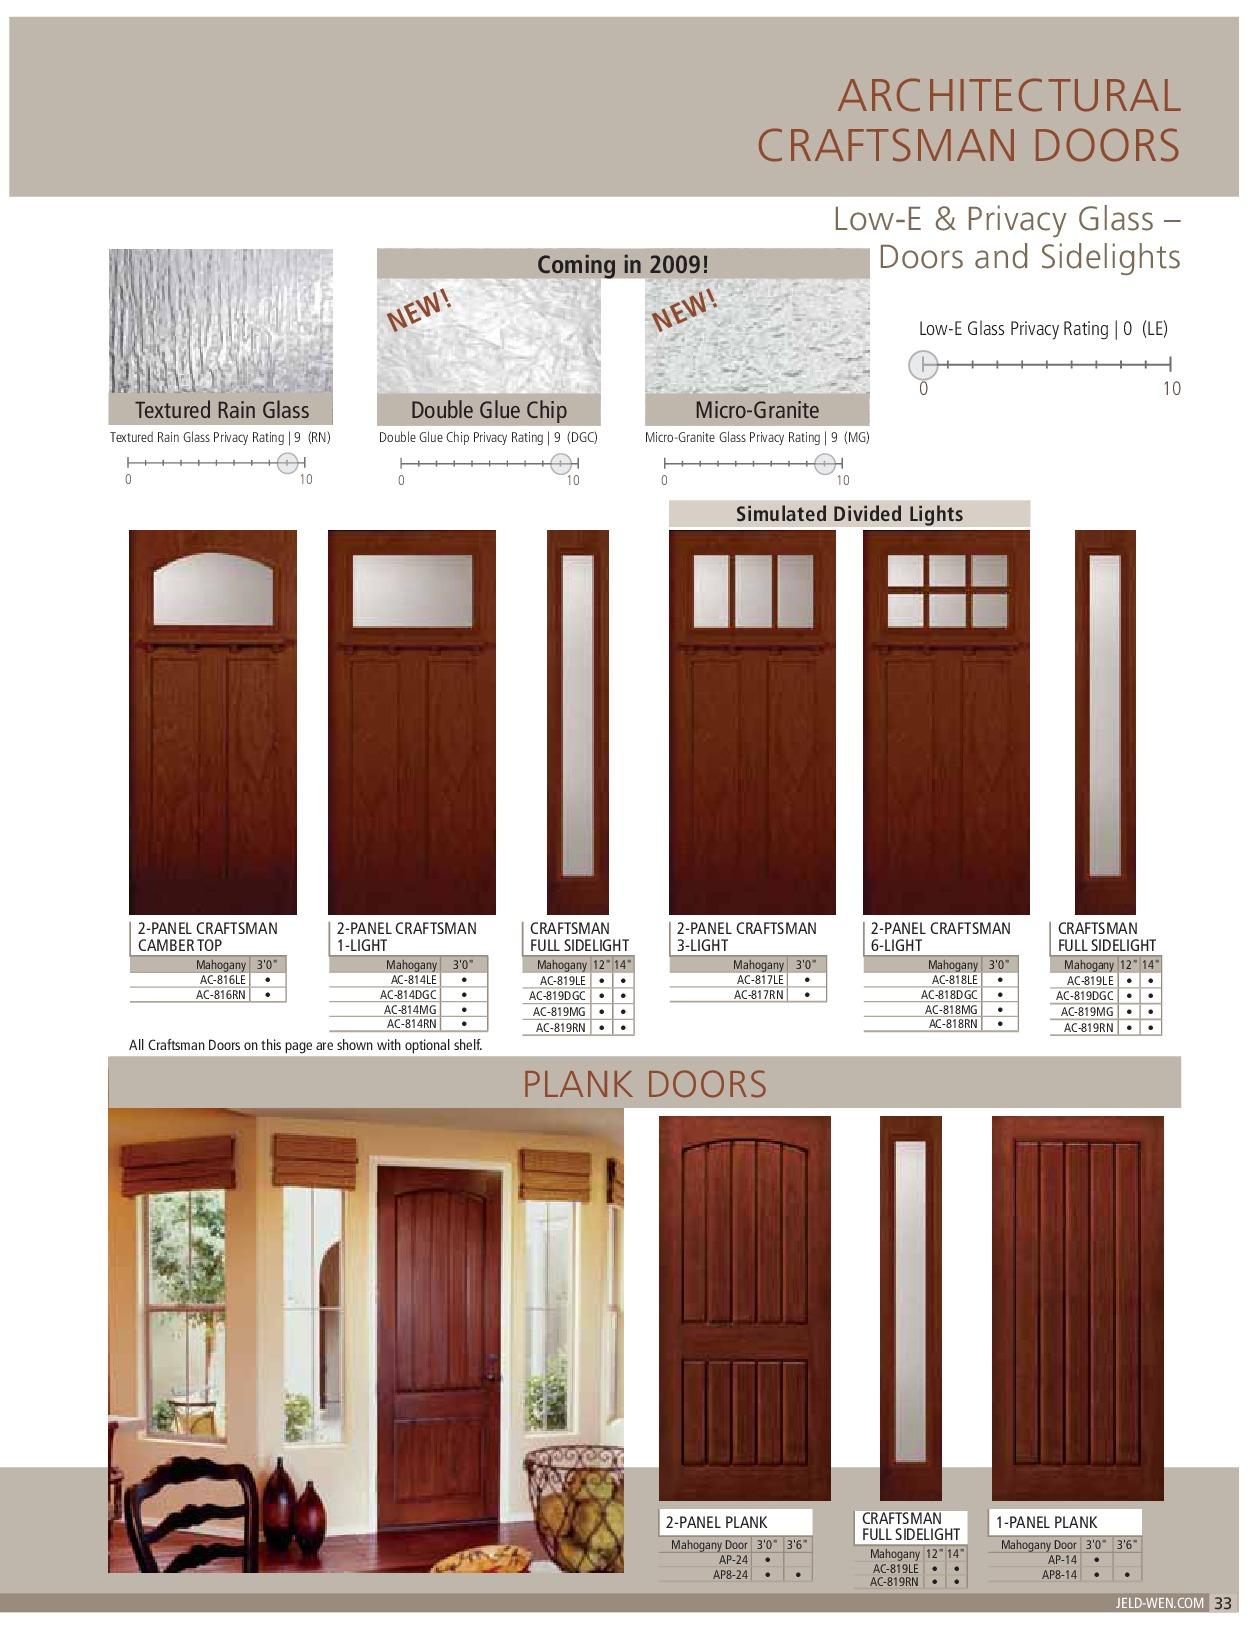 Impact Windows And Doors Miami Fl Mr Door Man Inc